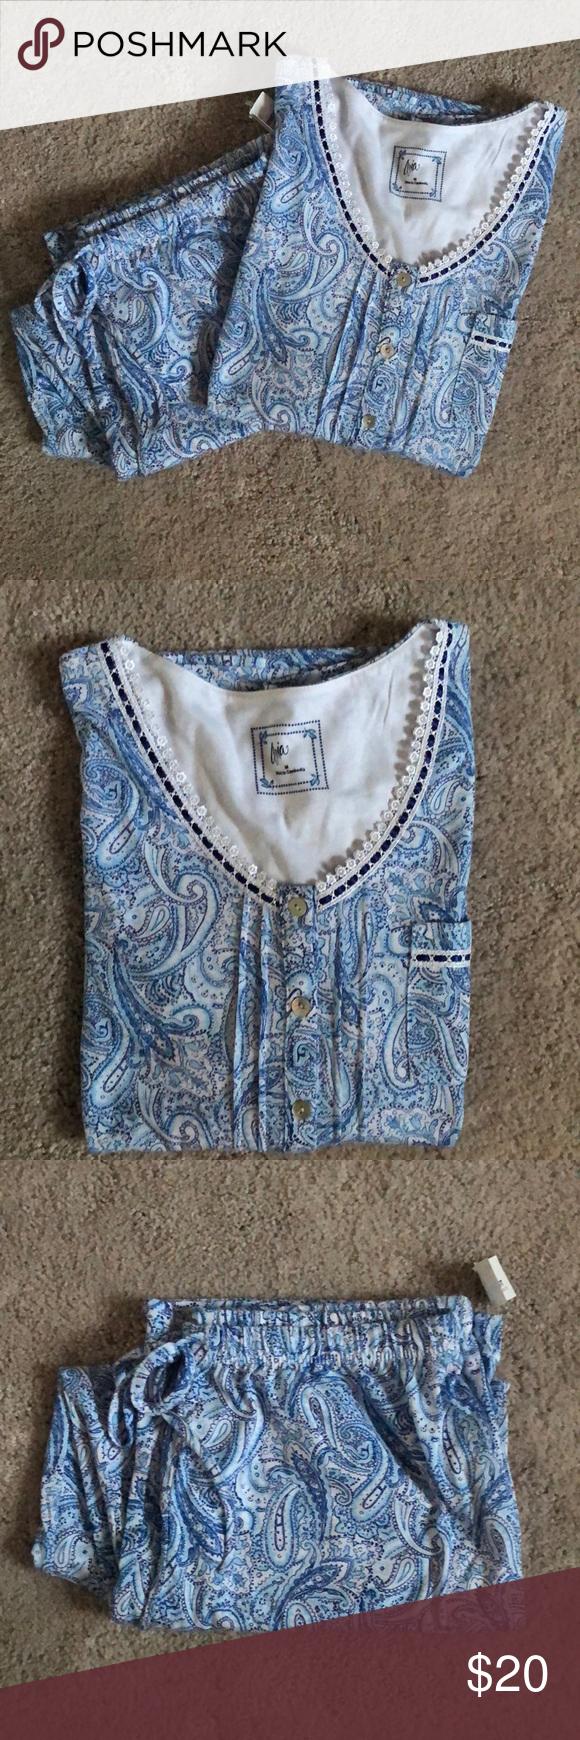 Nwtaria Pajama Set Size Medium New With Tag Blue Patterned Aria